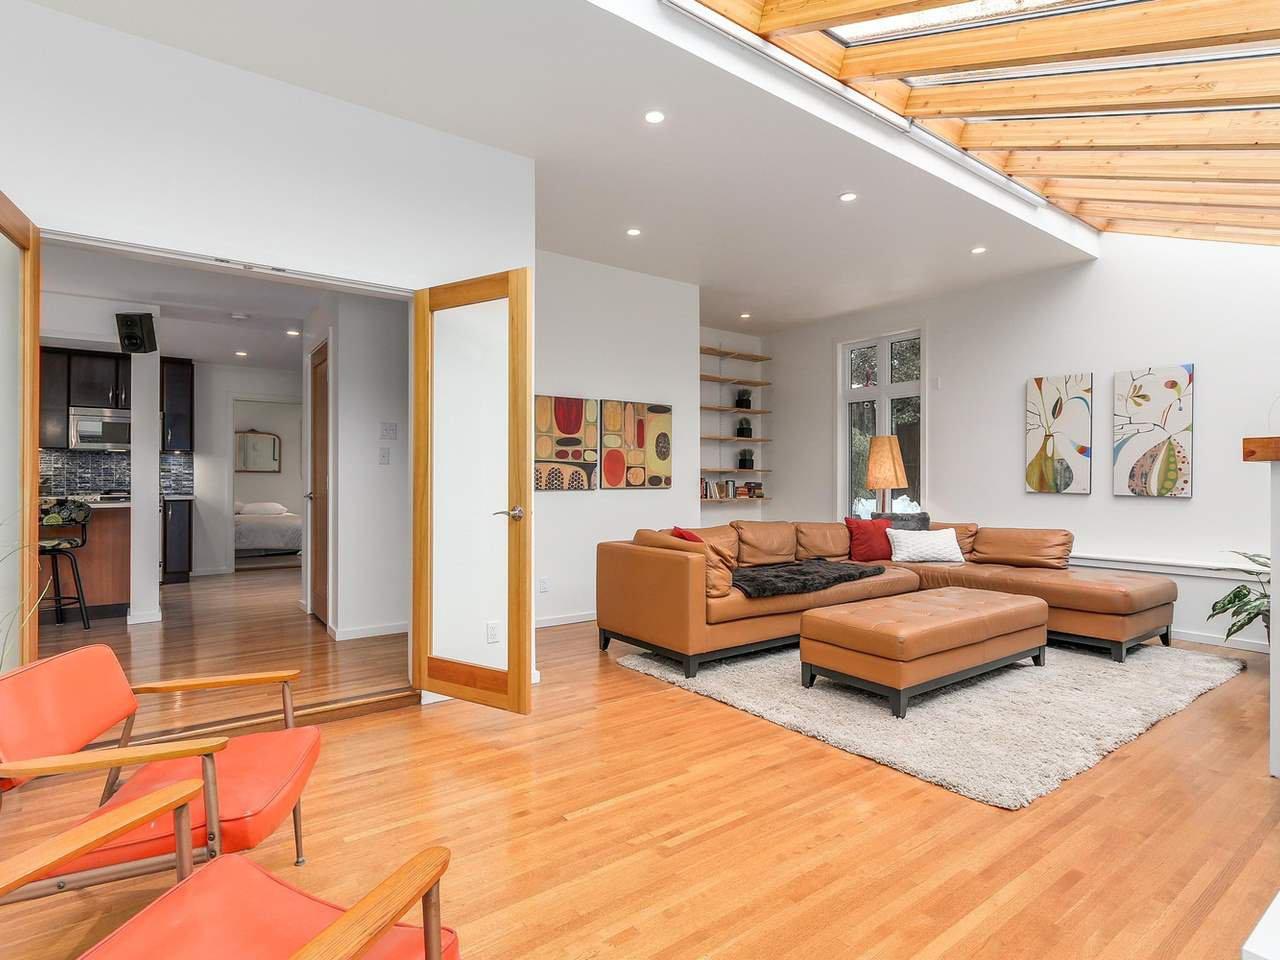 Photo 12: Photos: 3708 EDGEMONT Boulevard in North Vancouver: Edgemont House Fourplex for sale : MLS®# R2138514